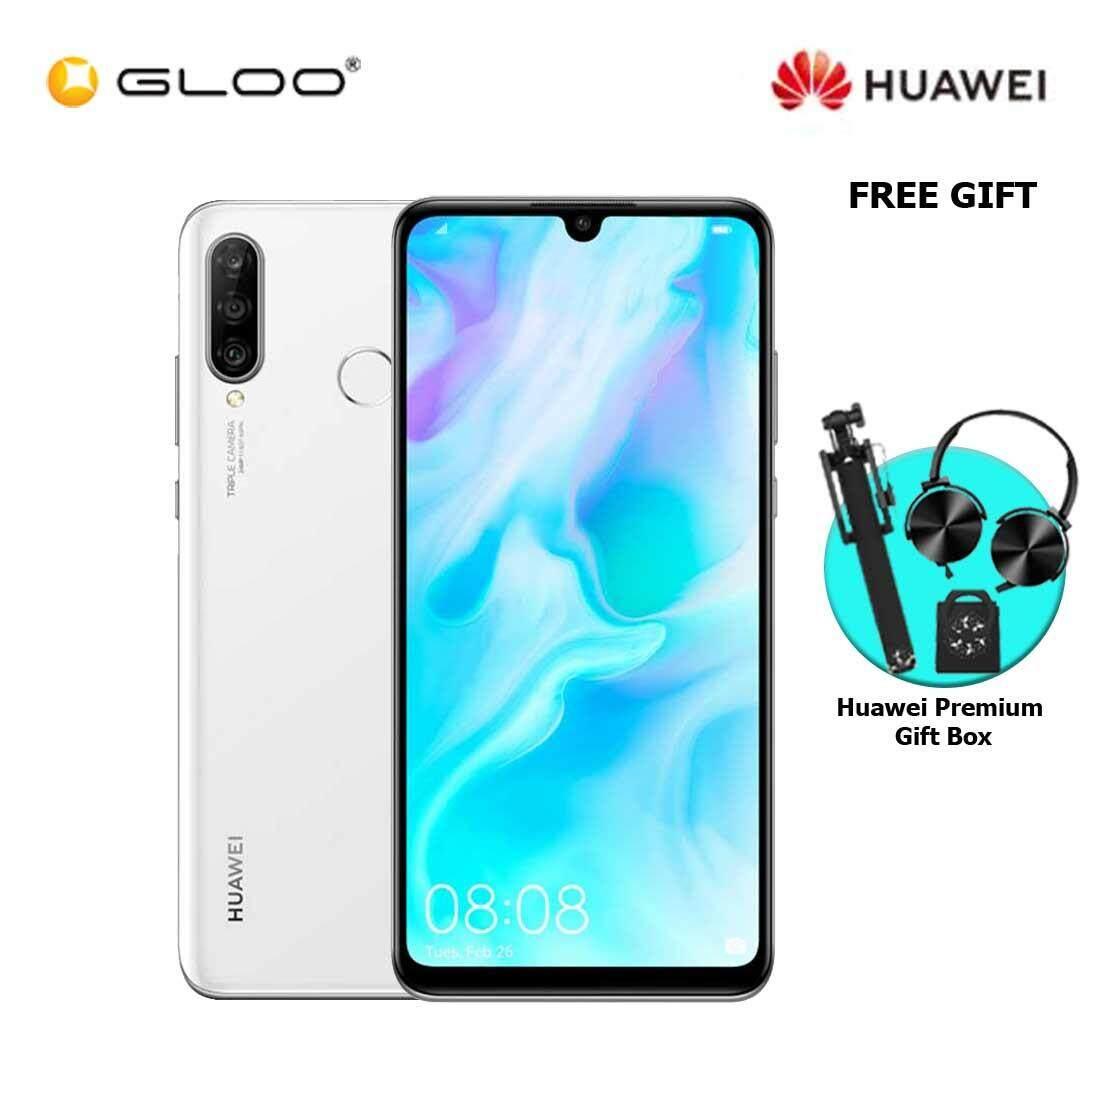 Huawei Nova 4E 6GB+128GB White + FREE Premium Gift Box (Headset/Selfie Stick/iRing)